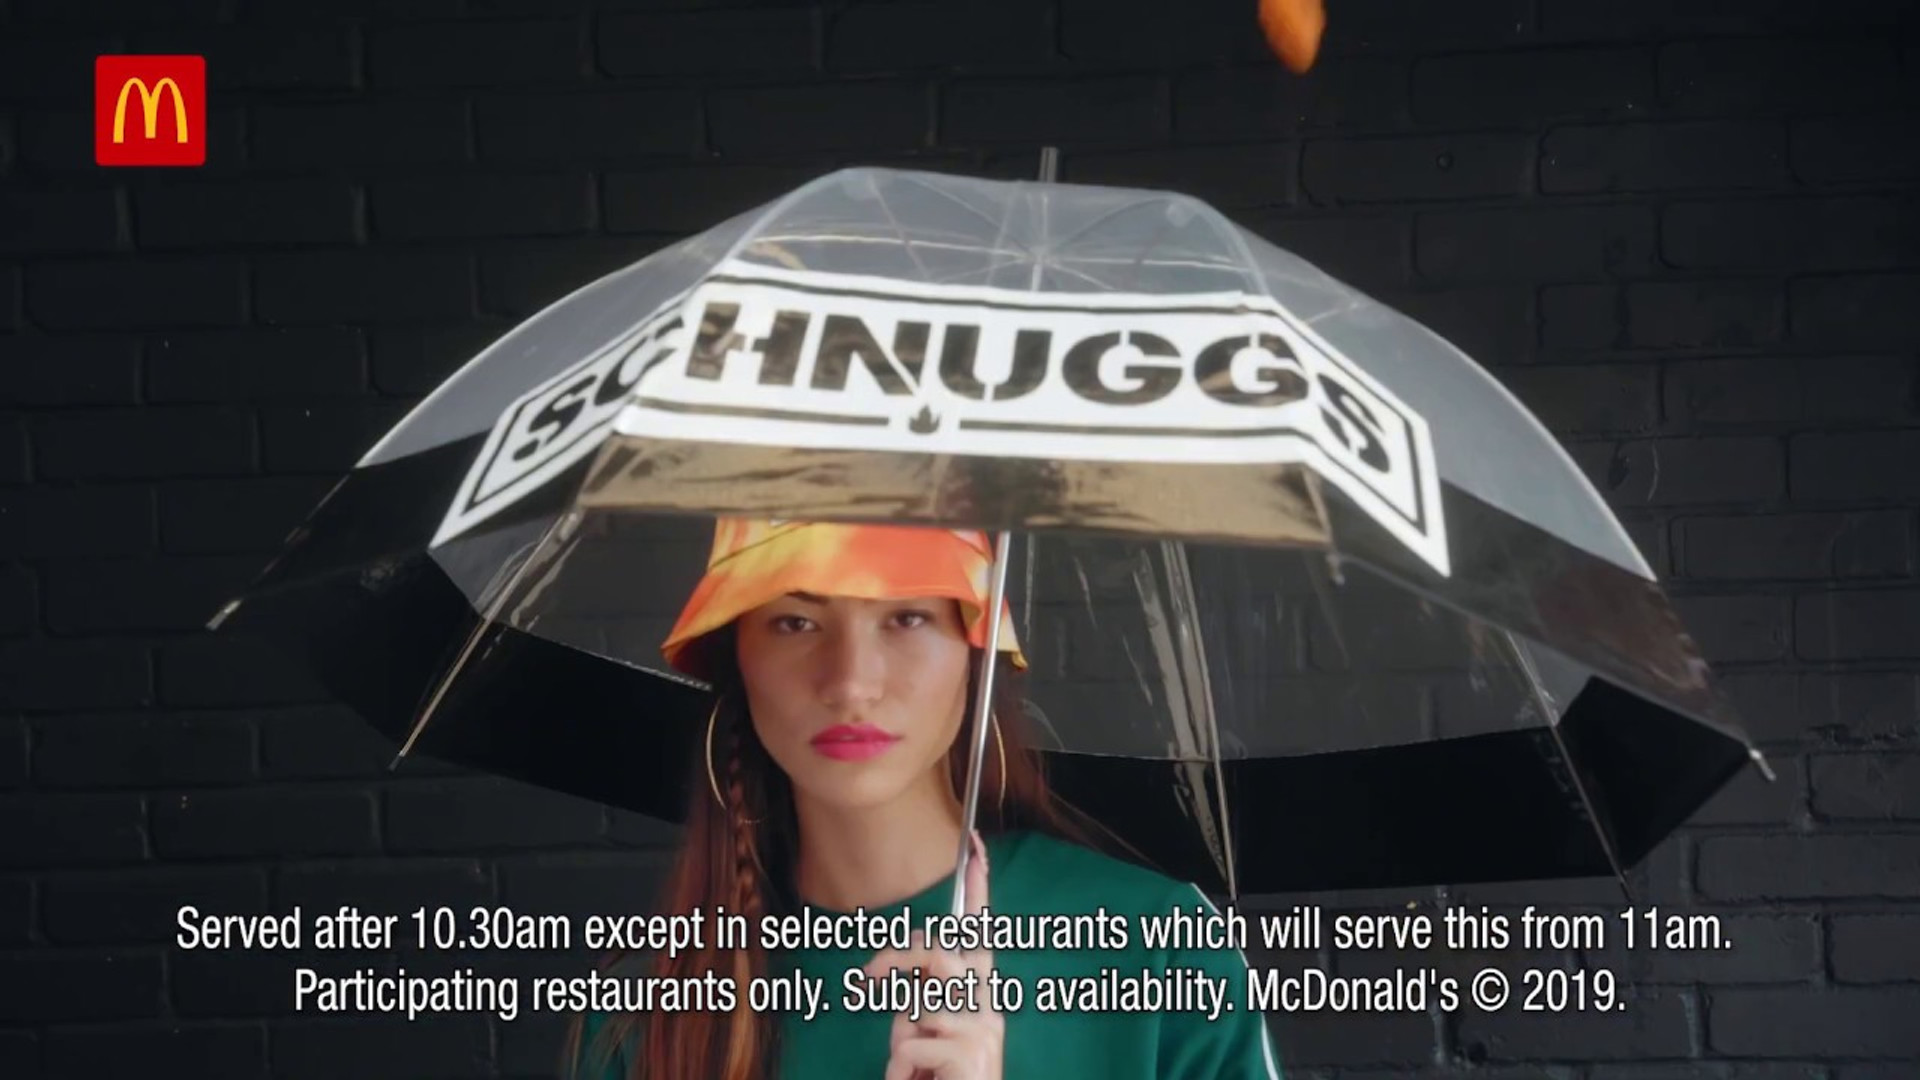 McDonalds Schnuggs